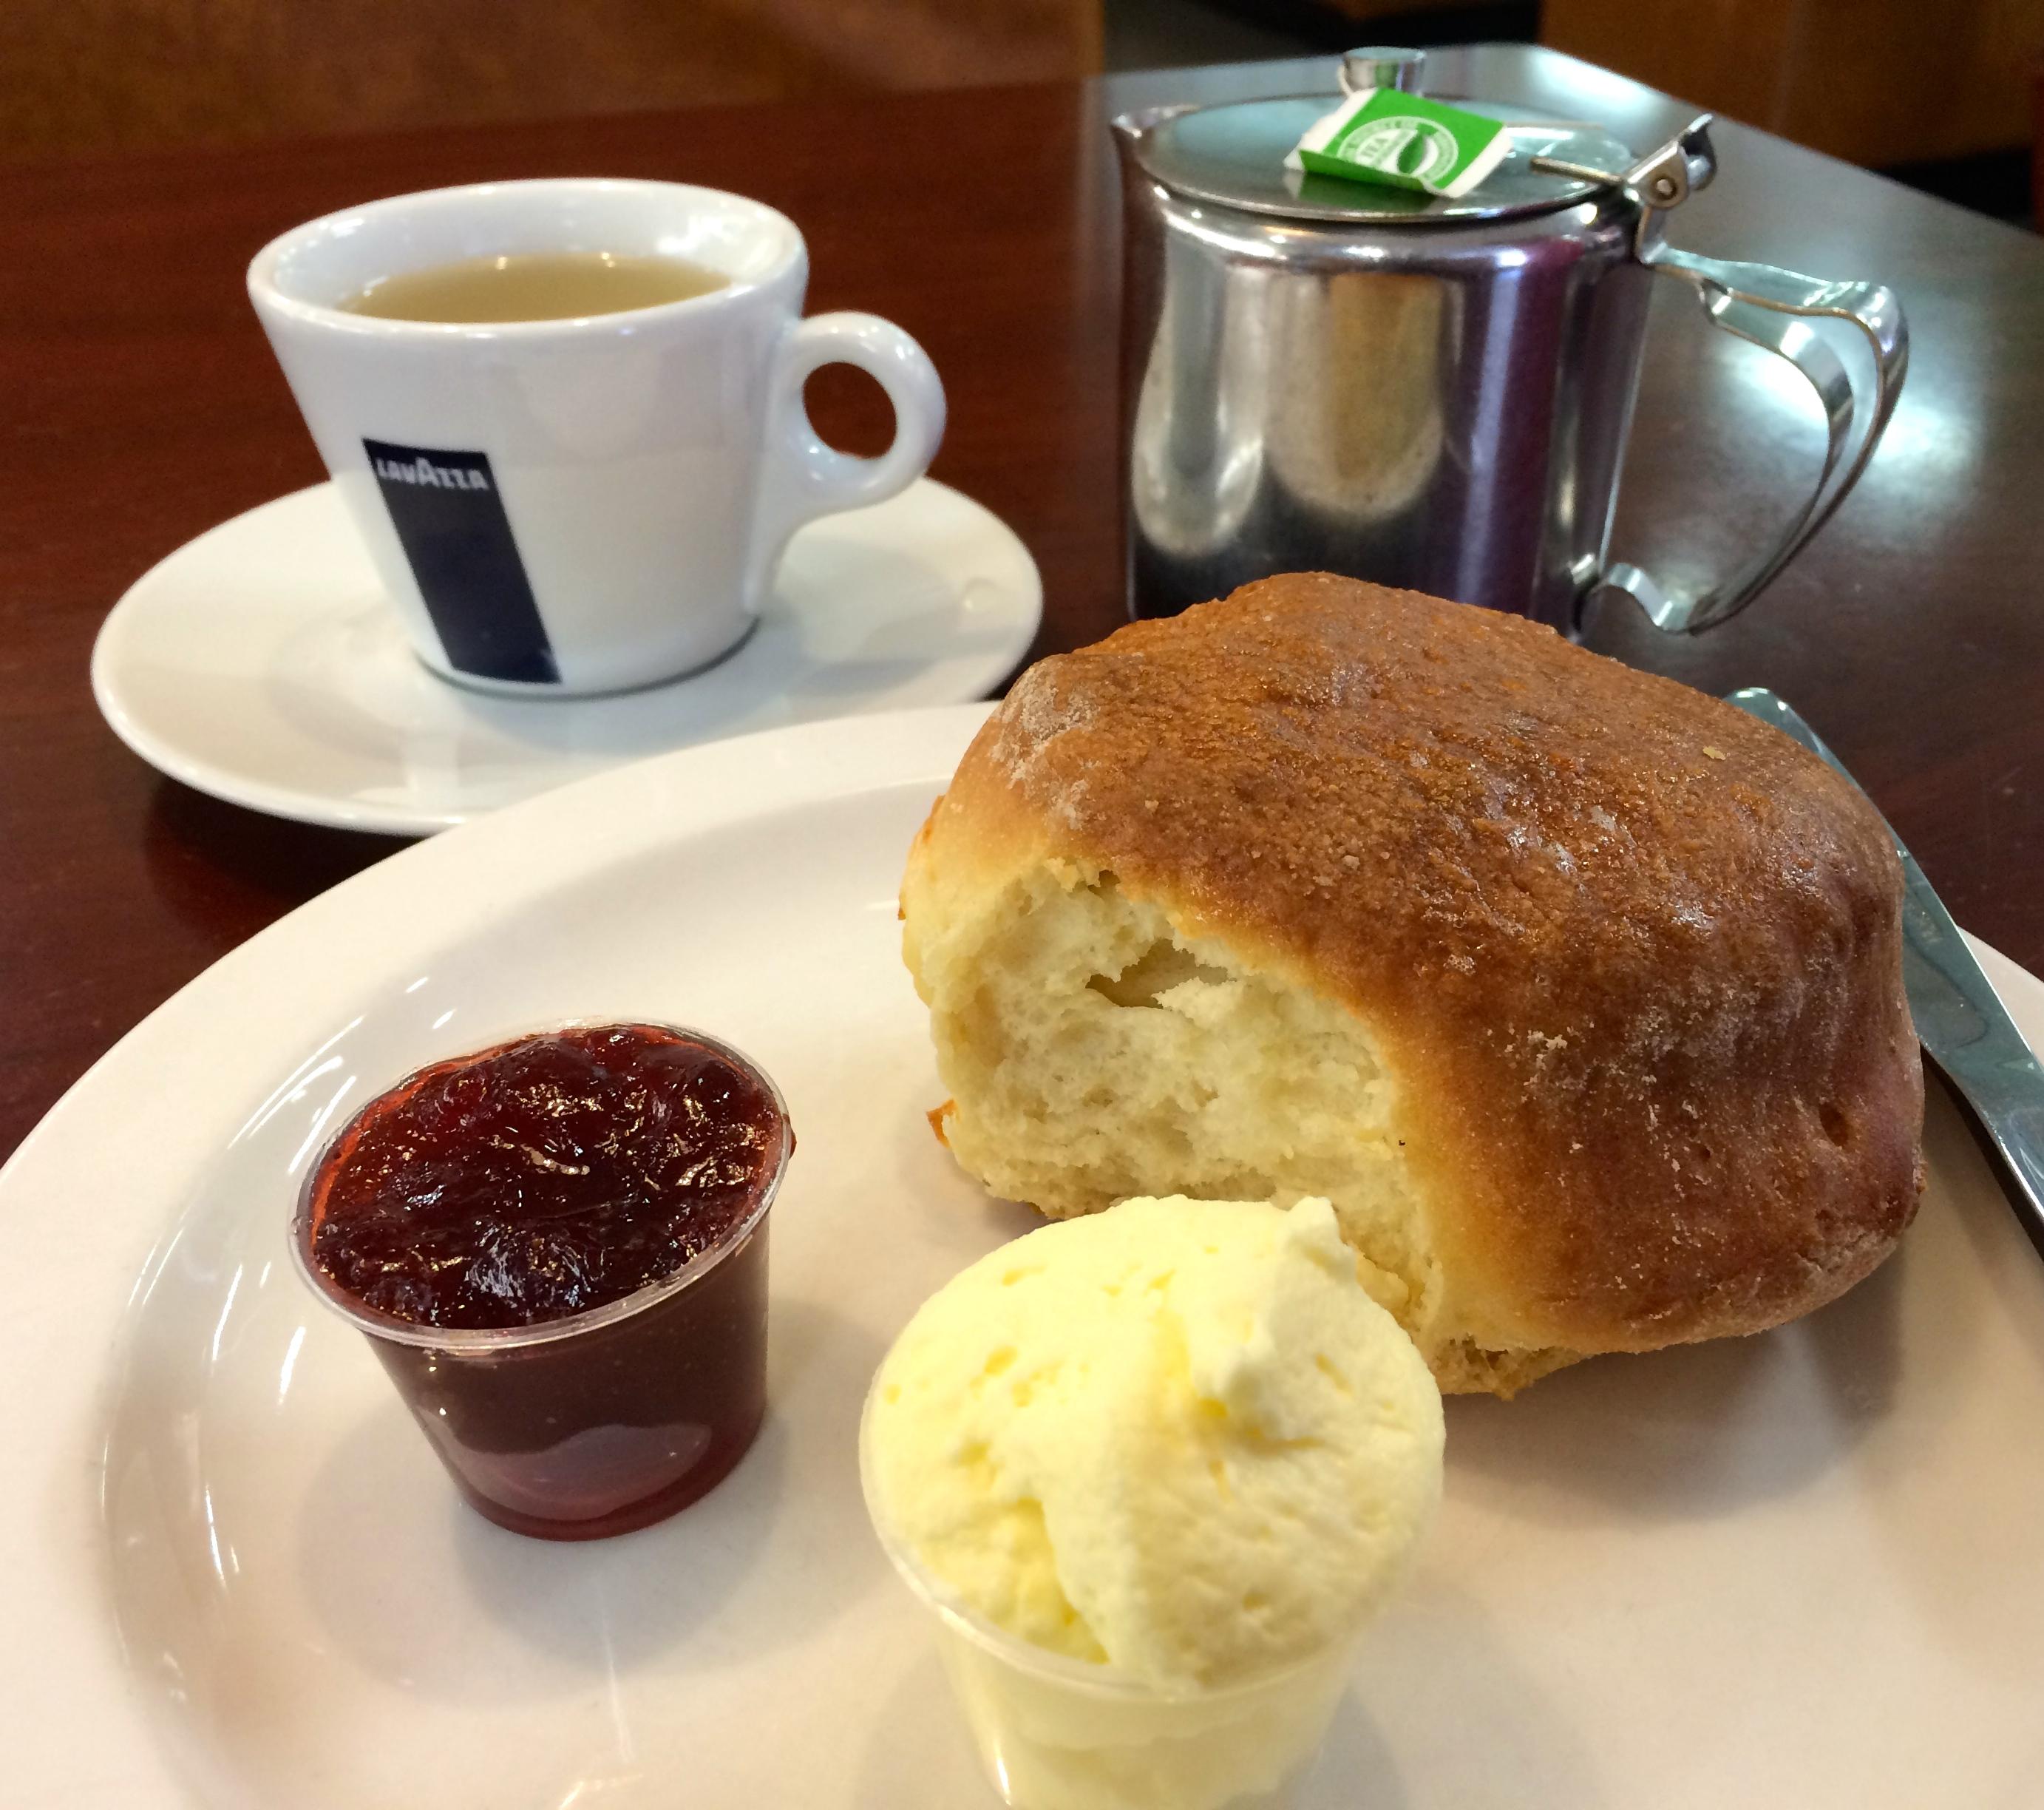 Met2 Cafeteria | The Devonshire Tea Guide